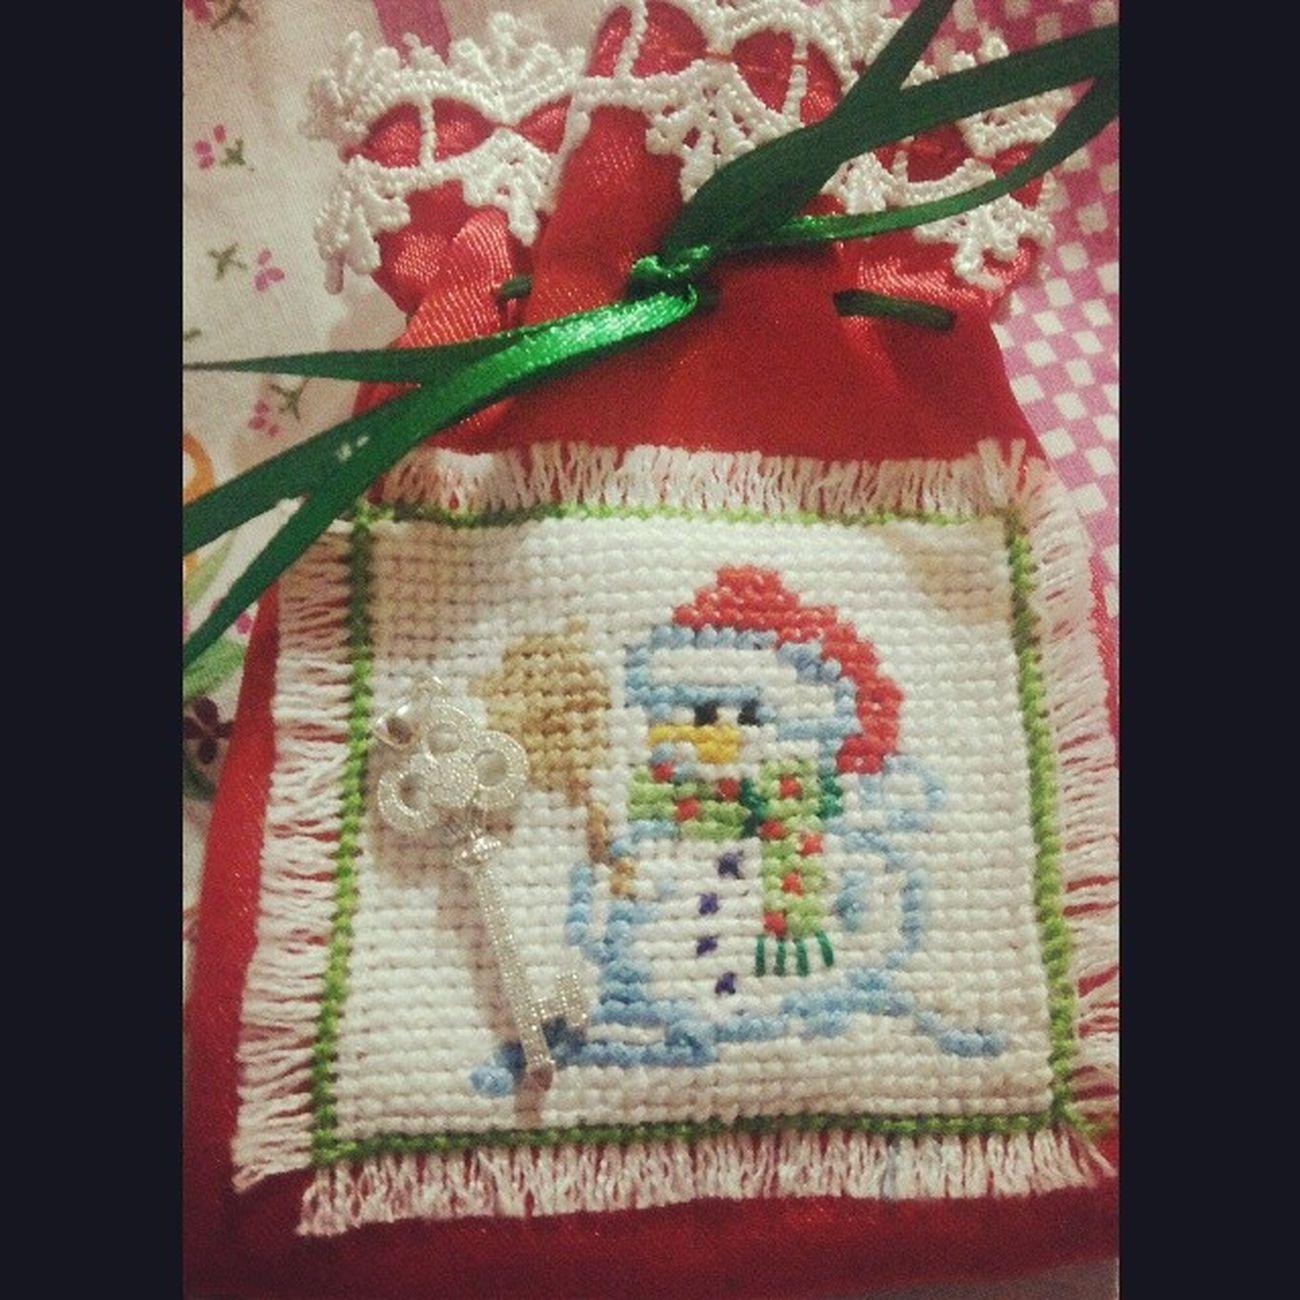 СвятойНиколай подарки ожидания радость beautiful sweet нежно ленточки снеговики